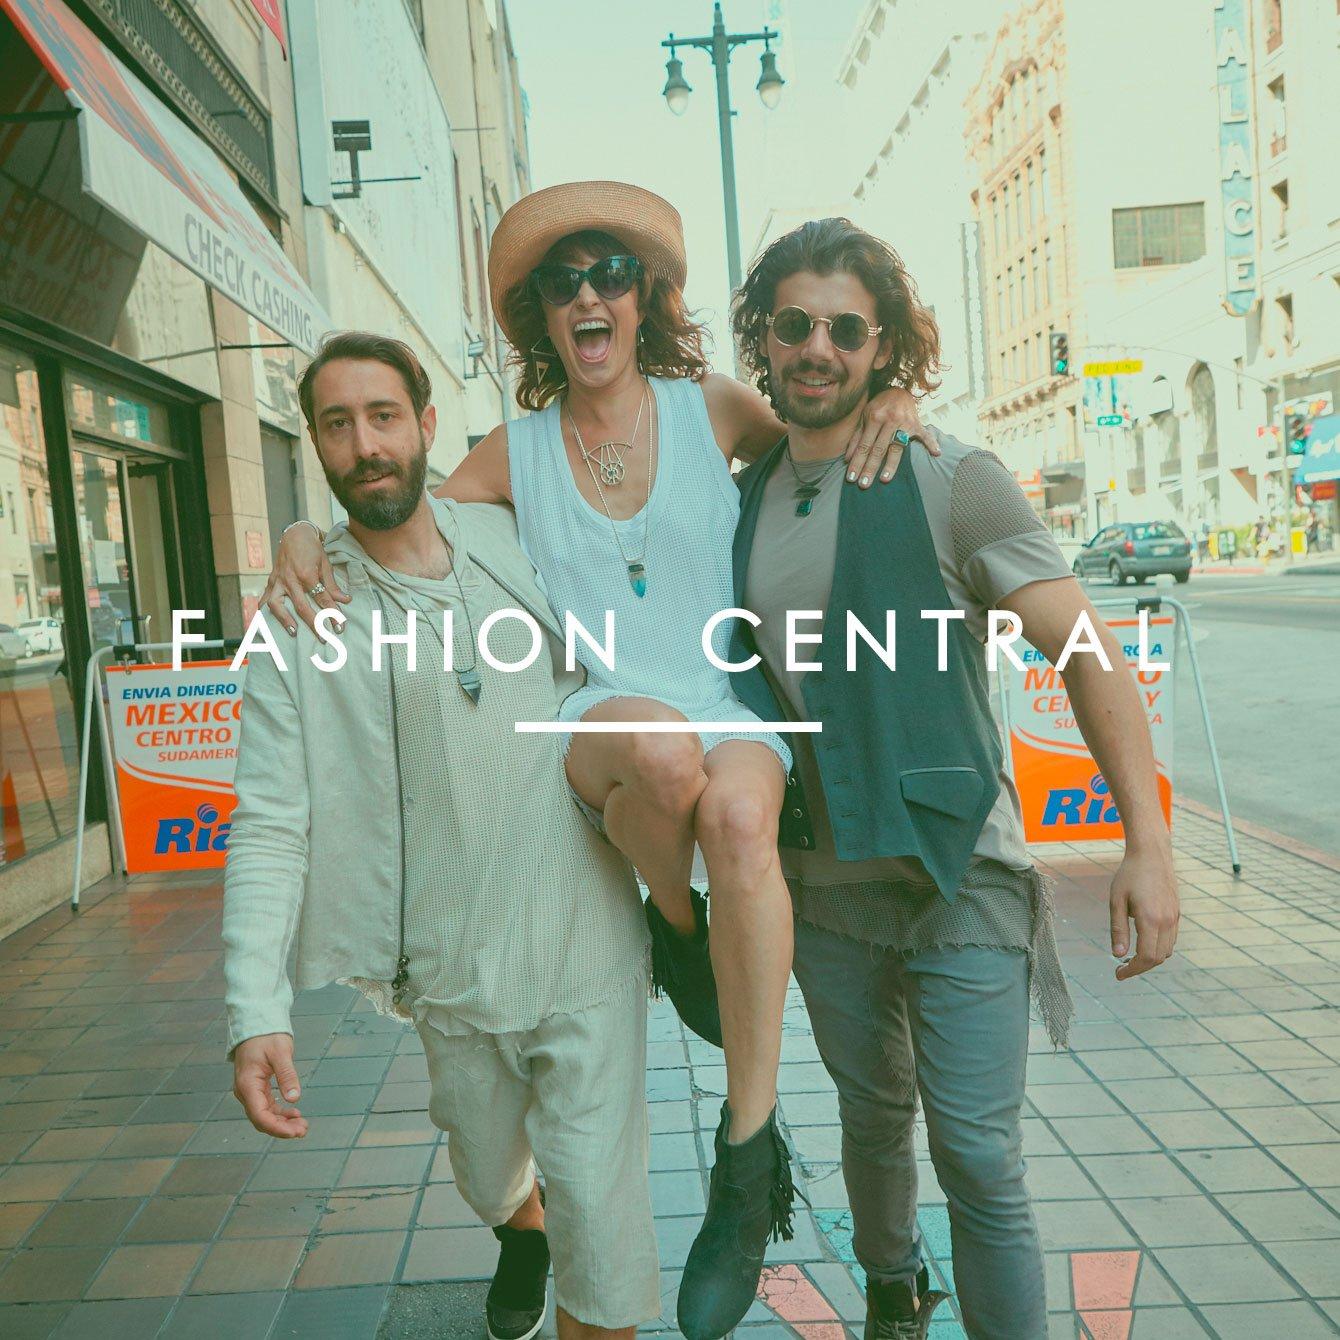 Fashion Central